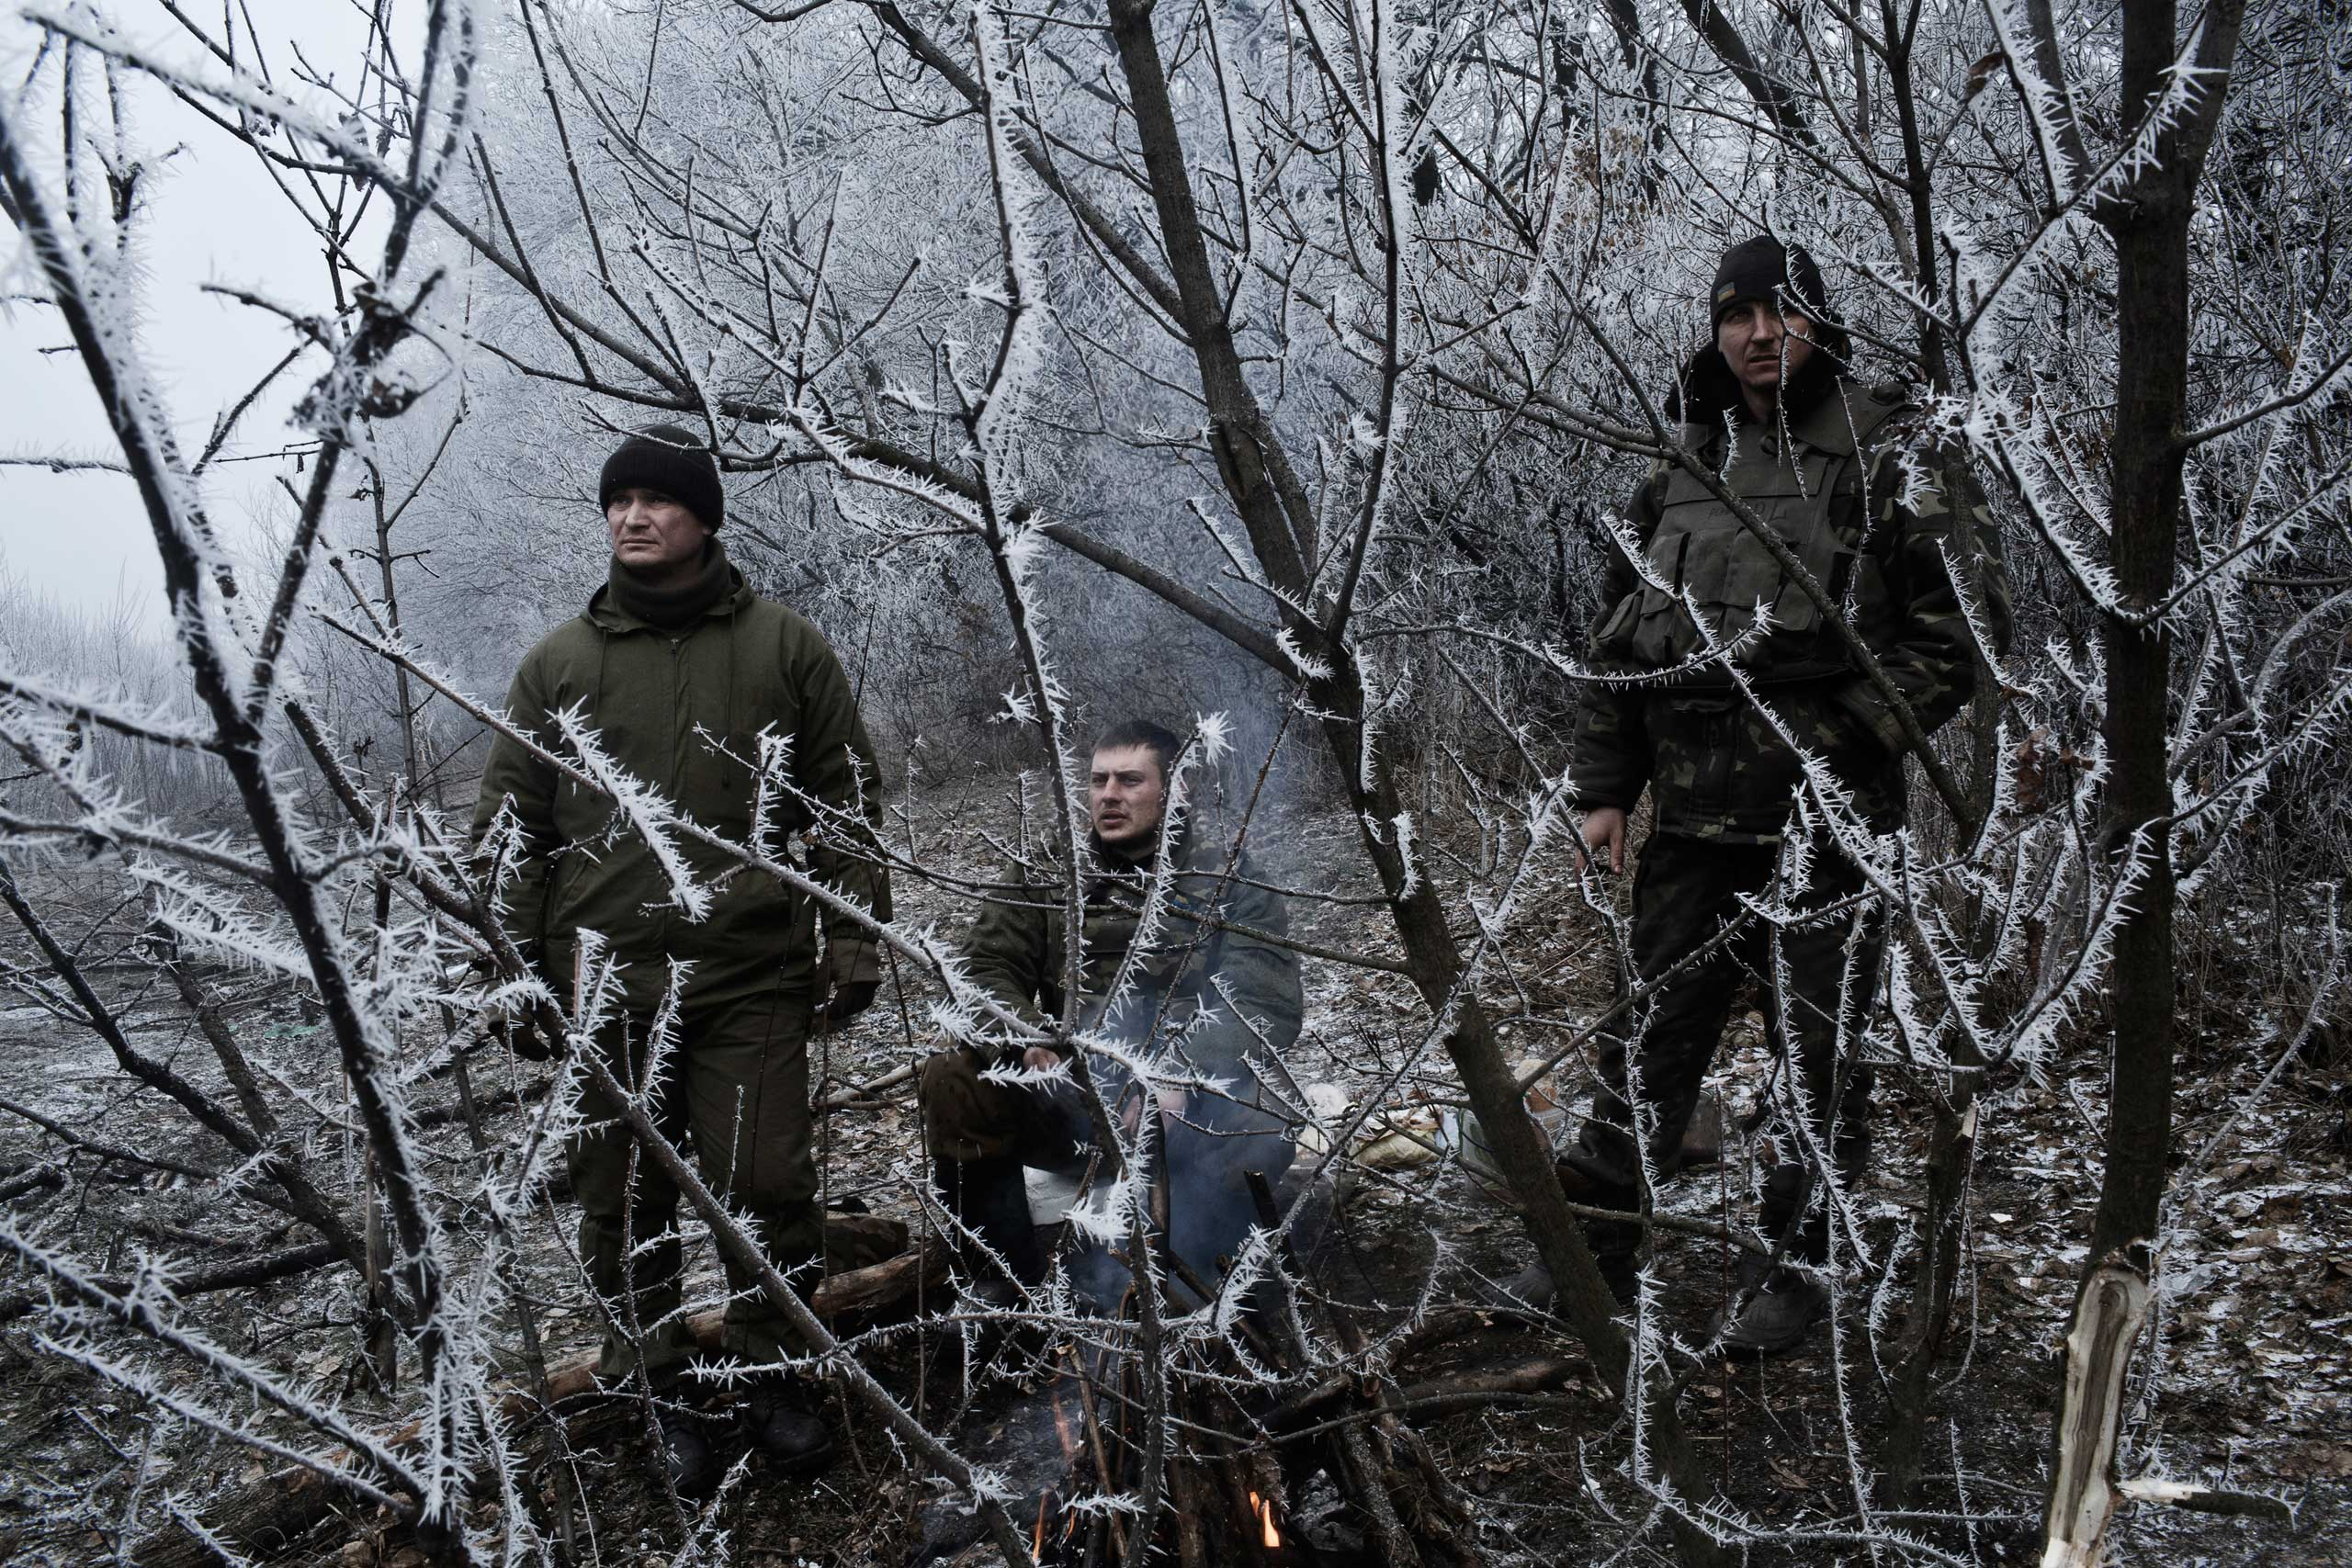 Ukrainian soldiers conduct operations along the road in Artemivsk, Ukraine, Feb.15, 2015.